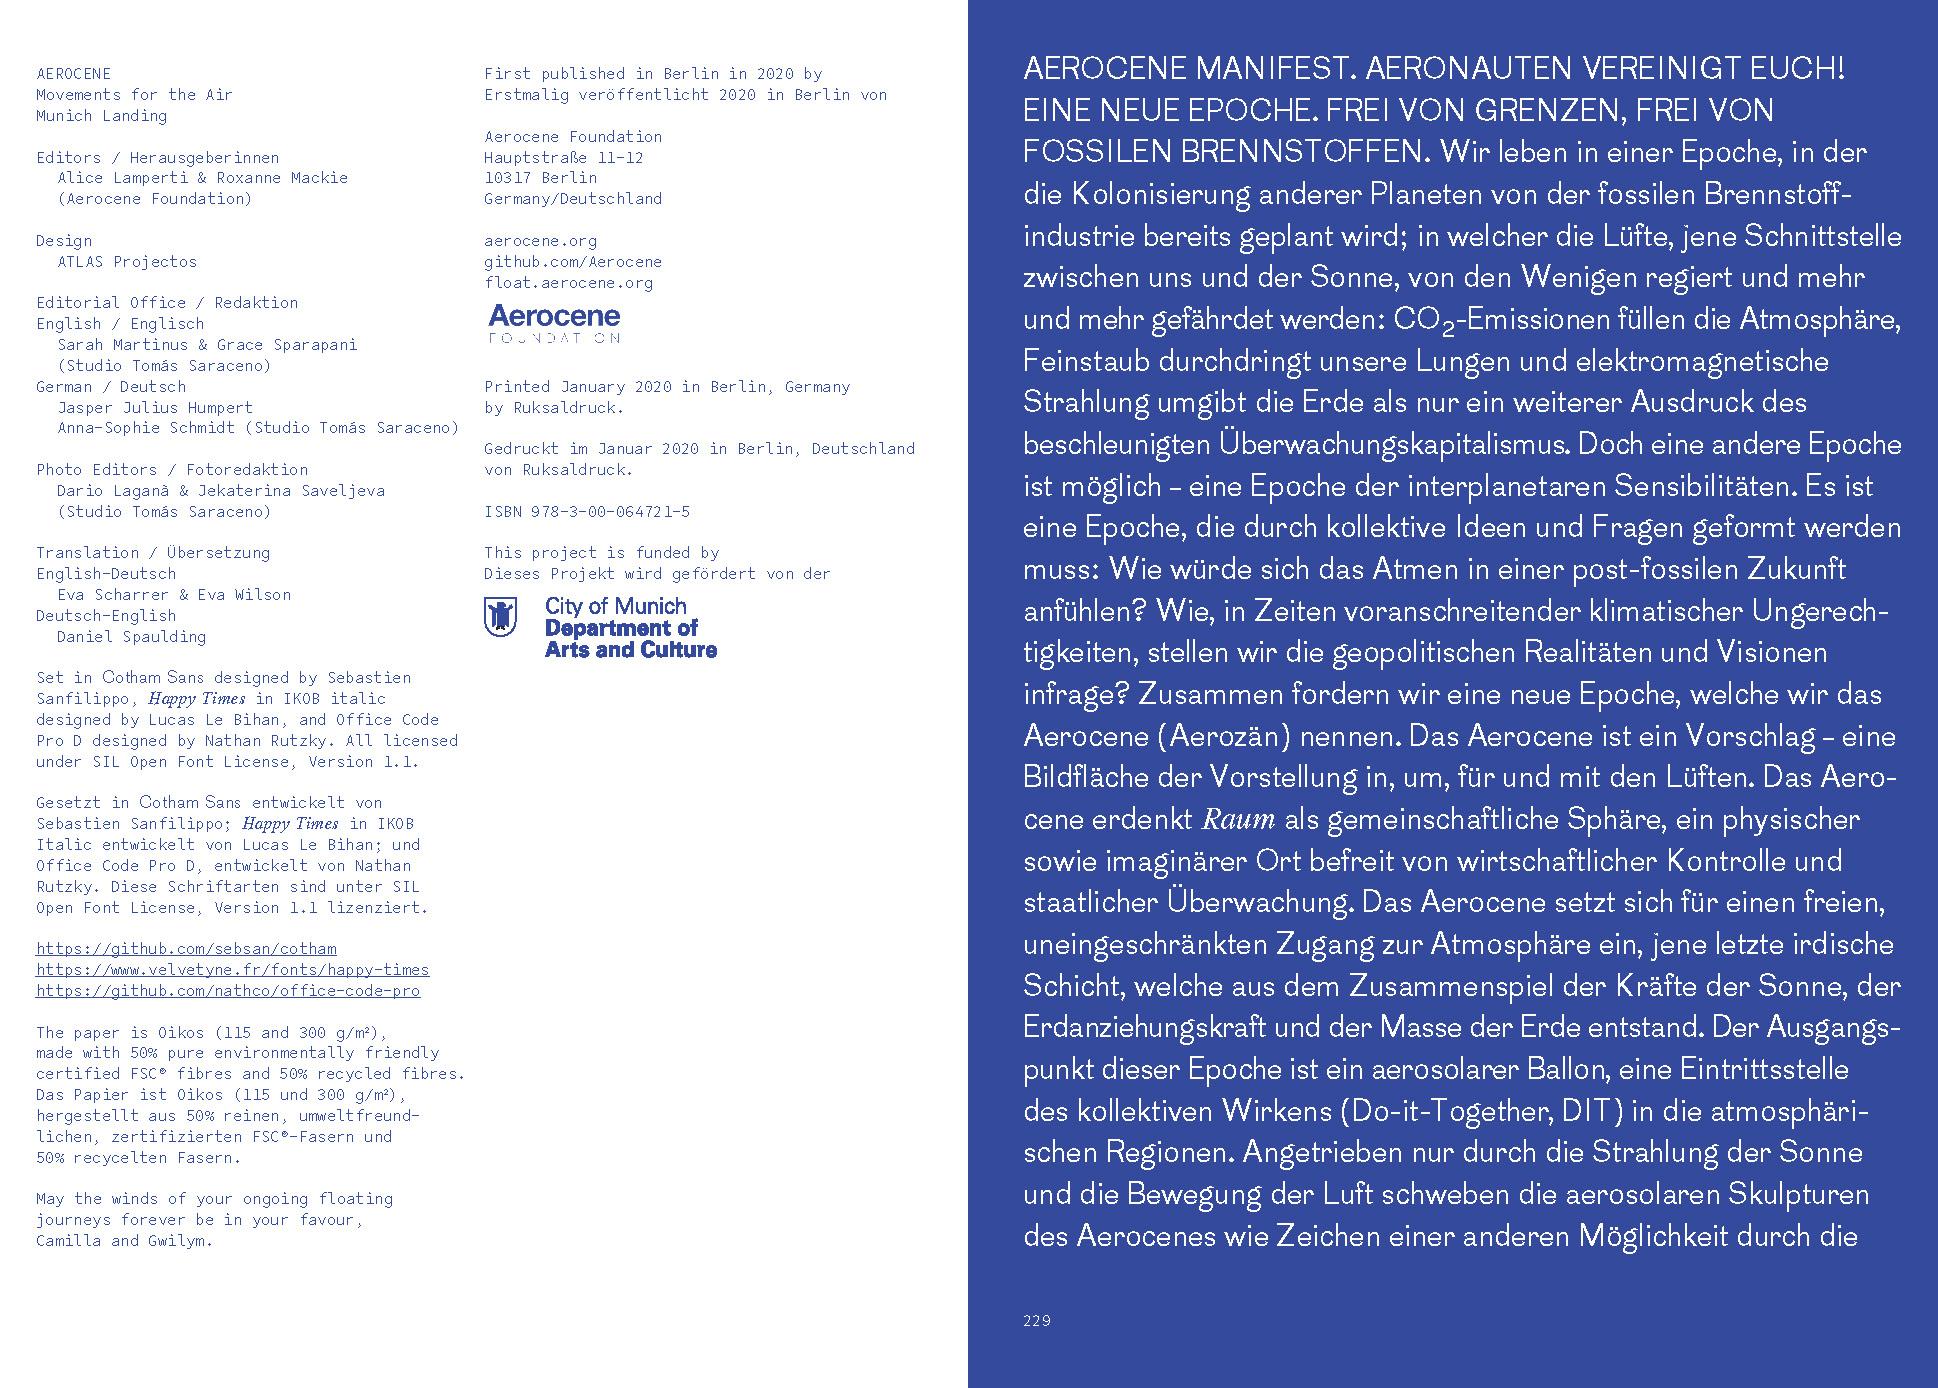 20AE_MovementsfortheAir_Aerocene (1)_Page_115